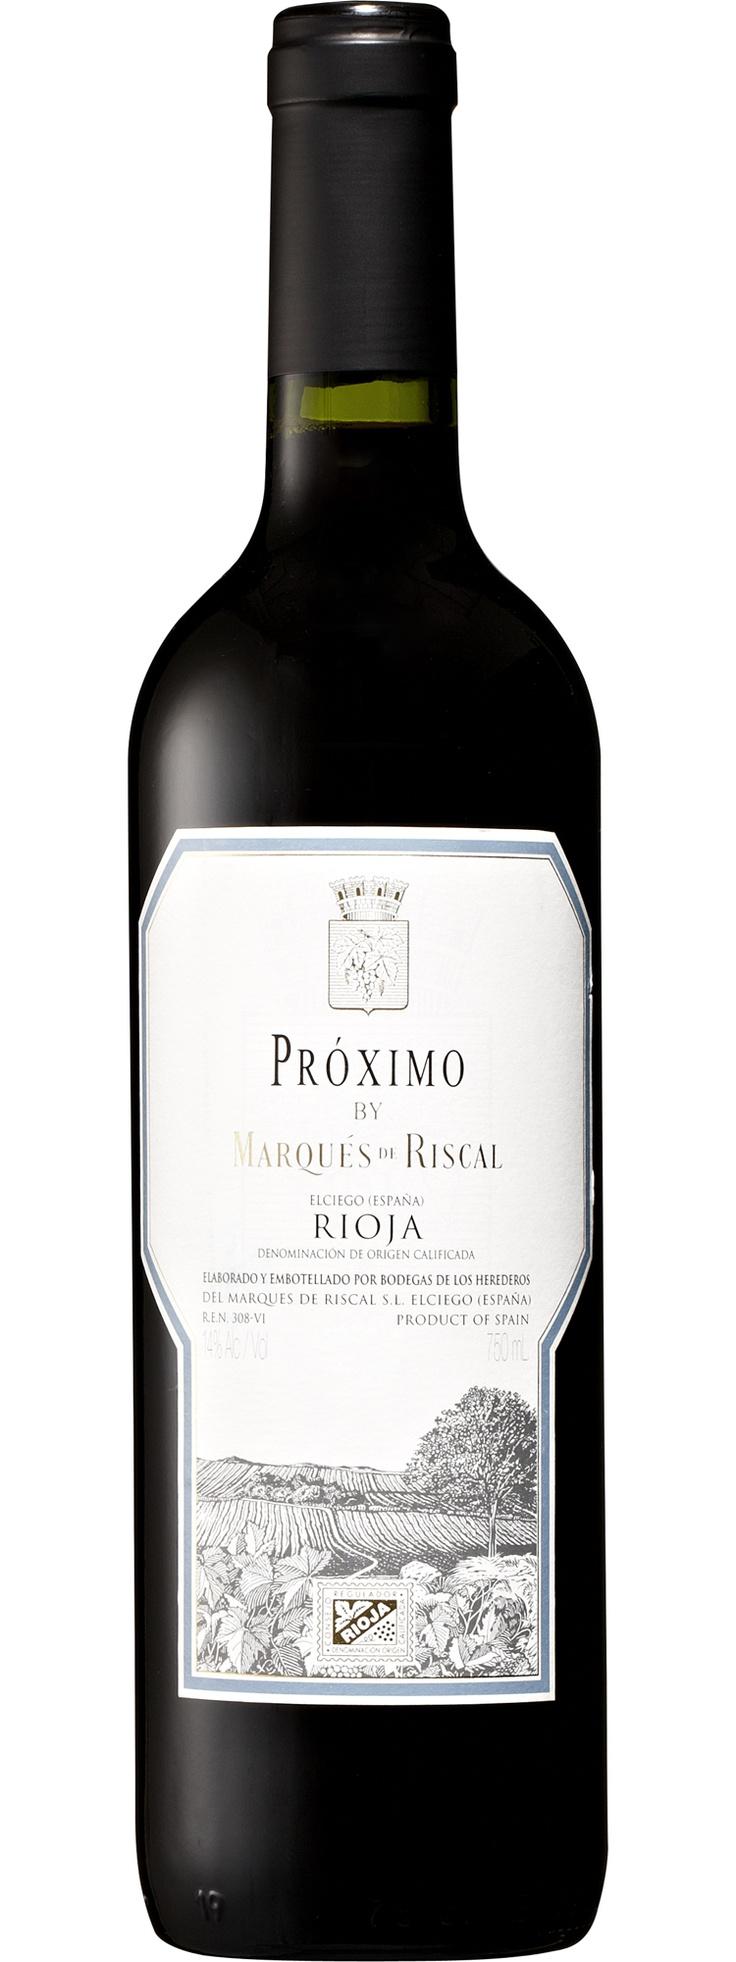 Marqués de Riscal Próximo Rioja - at $10 a bottle, reasonable quaffer